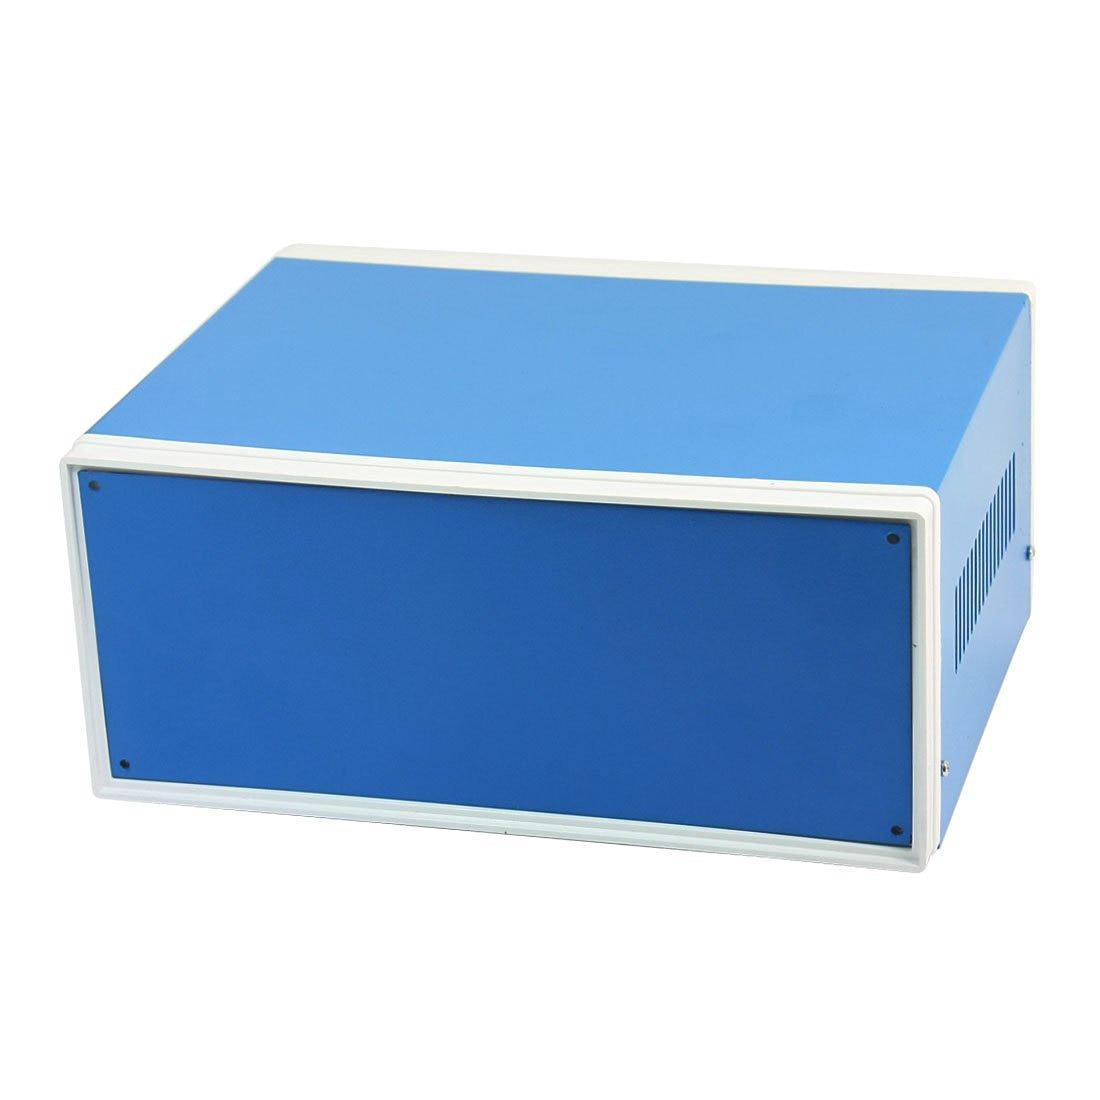 9.8 x 7.5 x 4.3 Blue Metal Enclosure Project Case DIY Junction Box 9 8 x 7 5 x 4 3 blue metal enclosure project case diy junction box